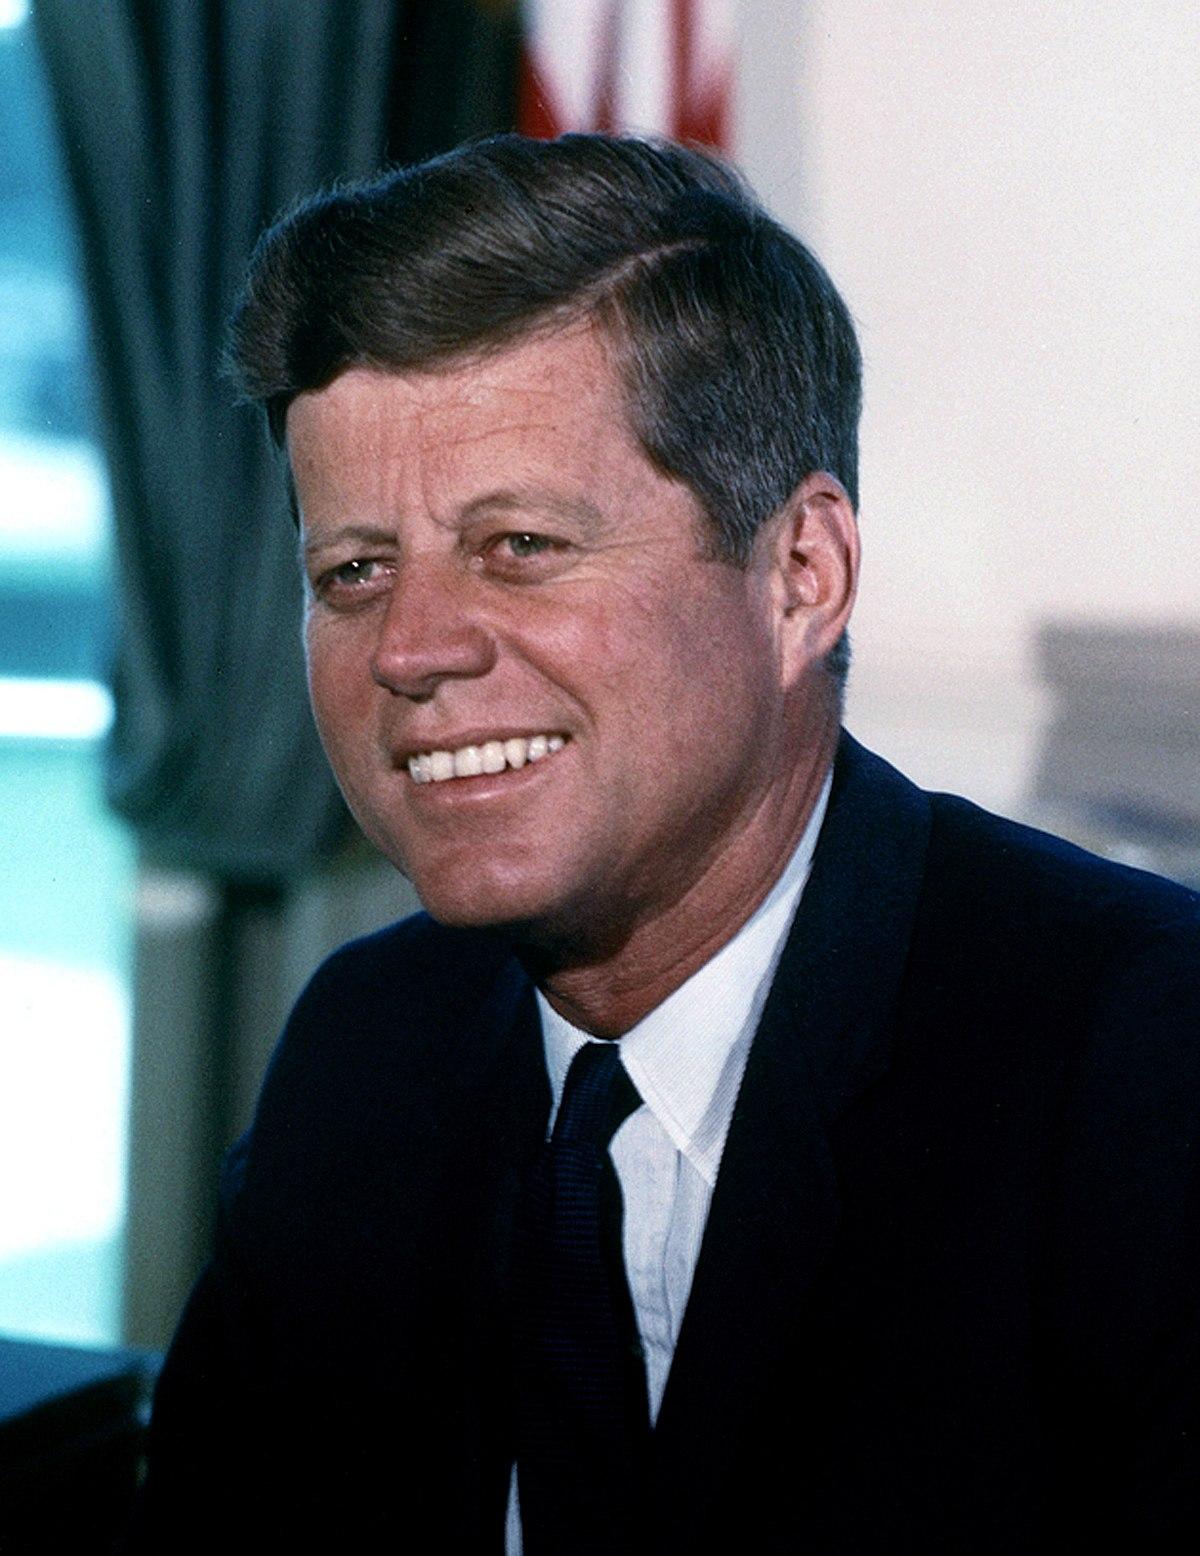 رئيس الامريكى جون كينيدي